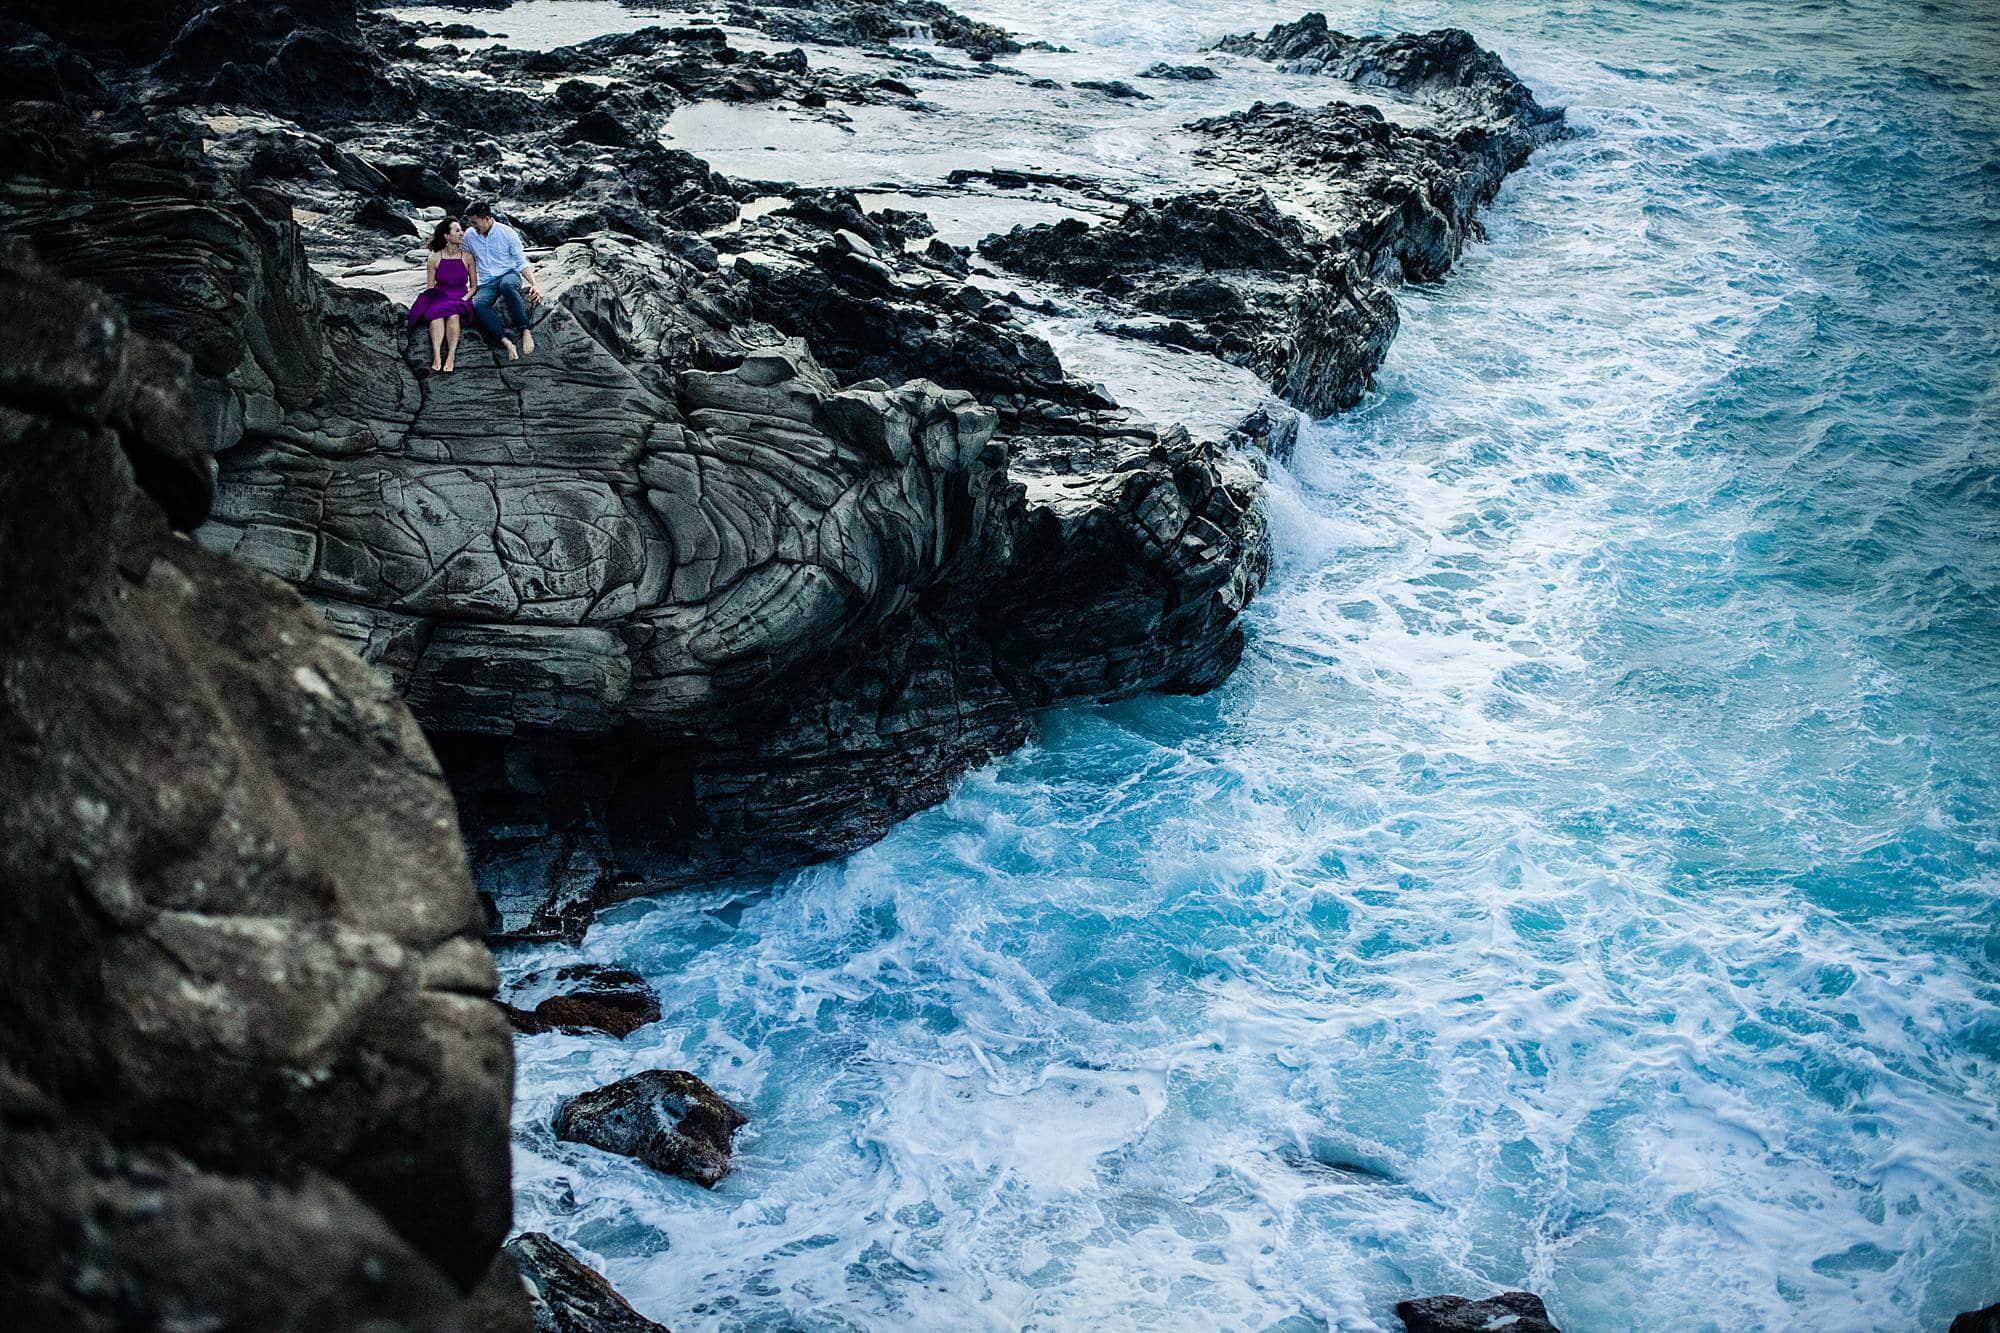 kapalua cliffs photos